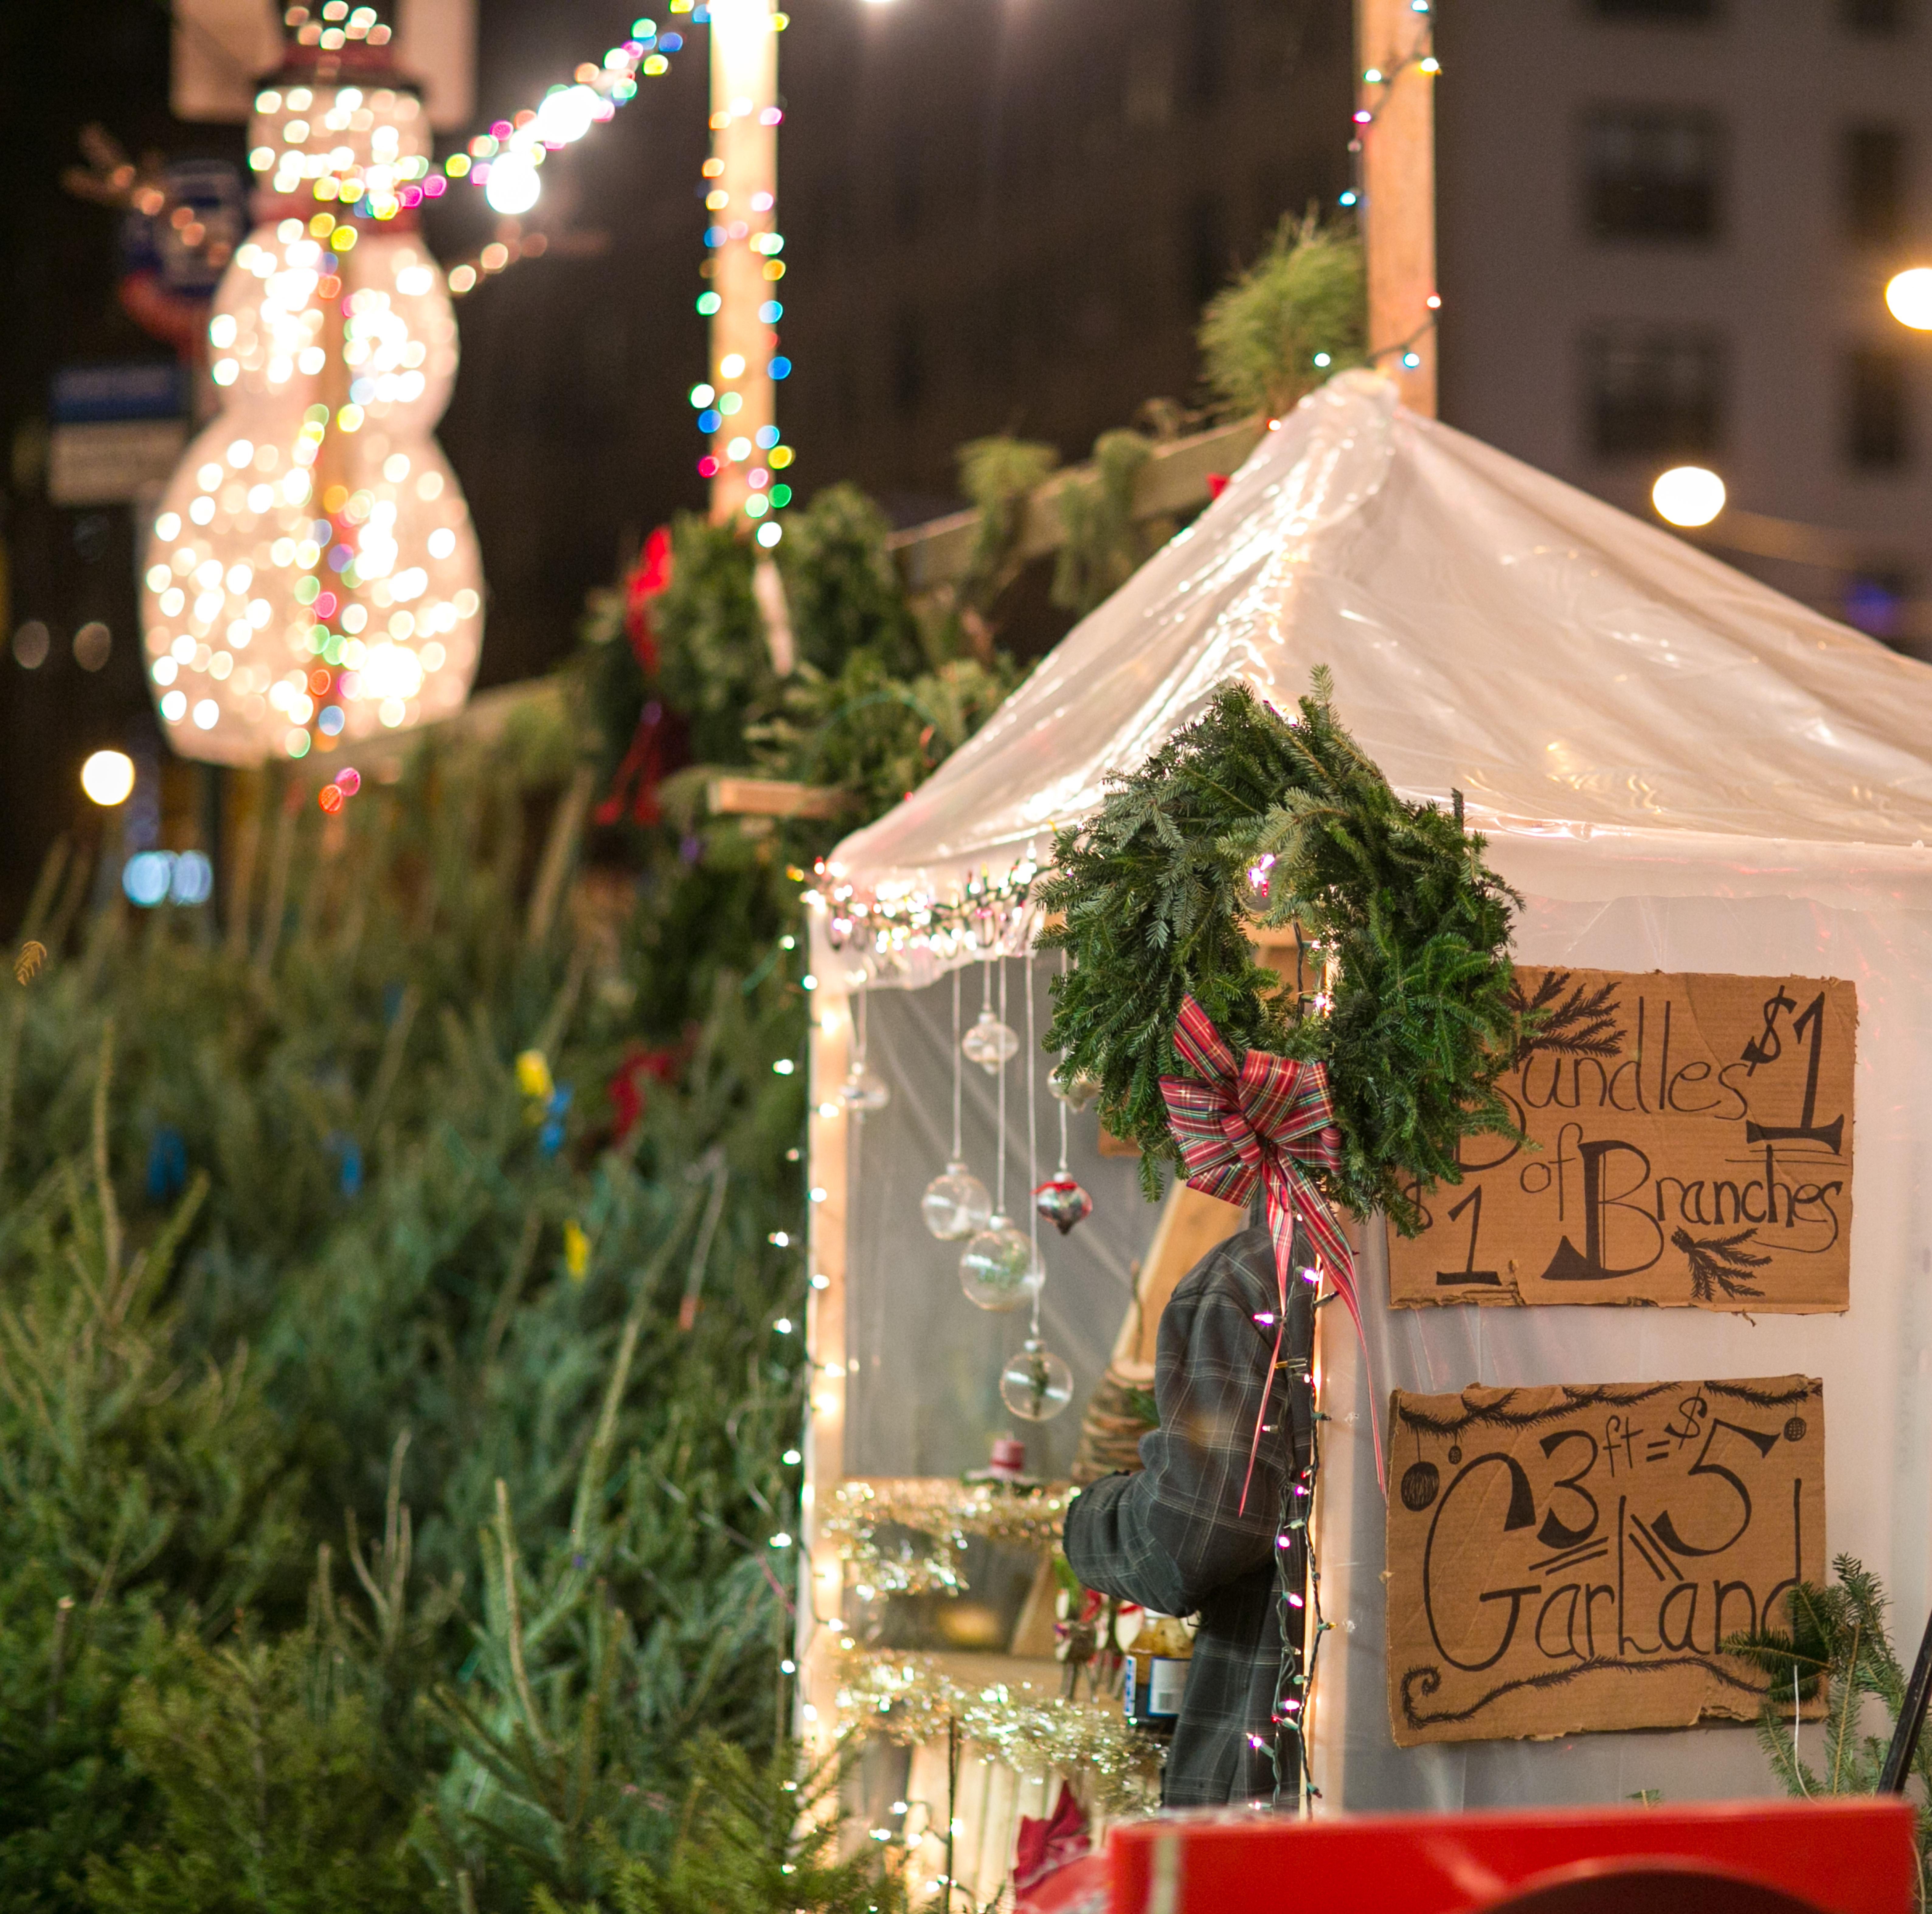 A Peek Behind the Curtain at New York's Christmas Tree Trade ...